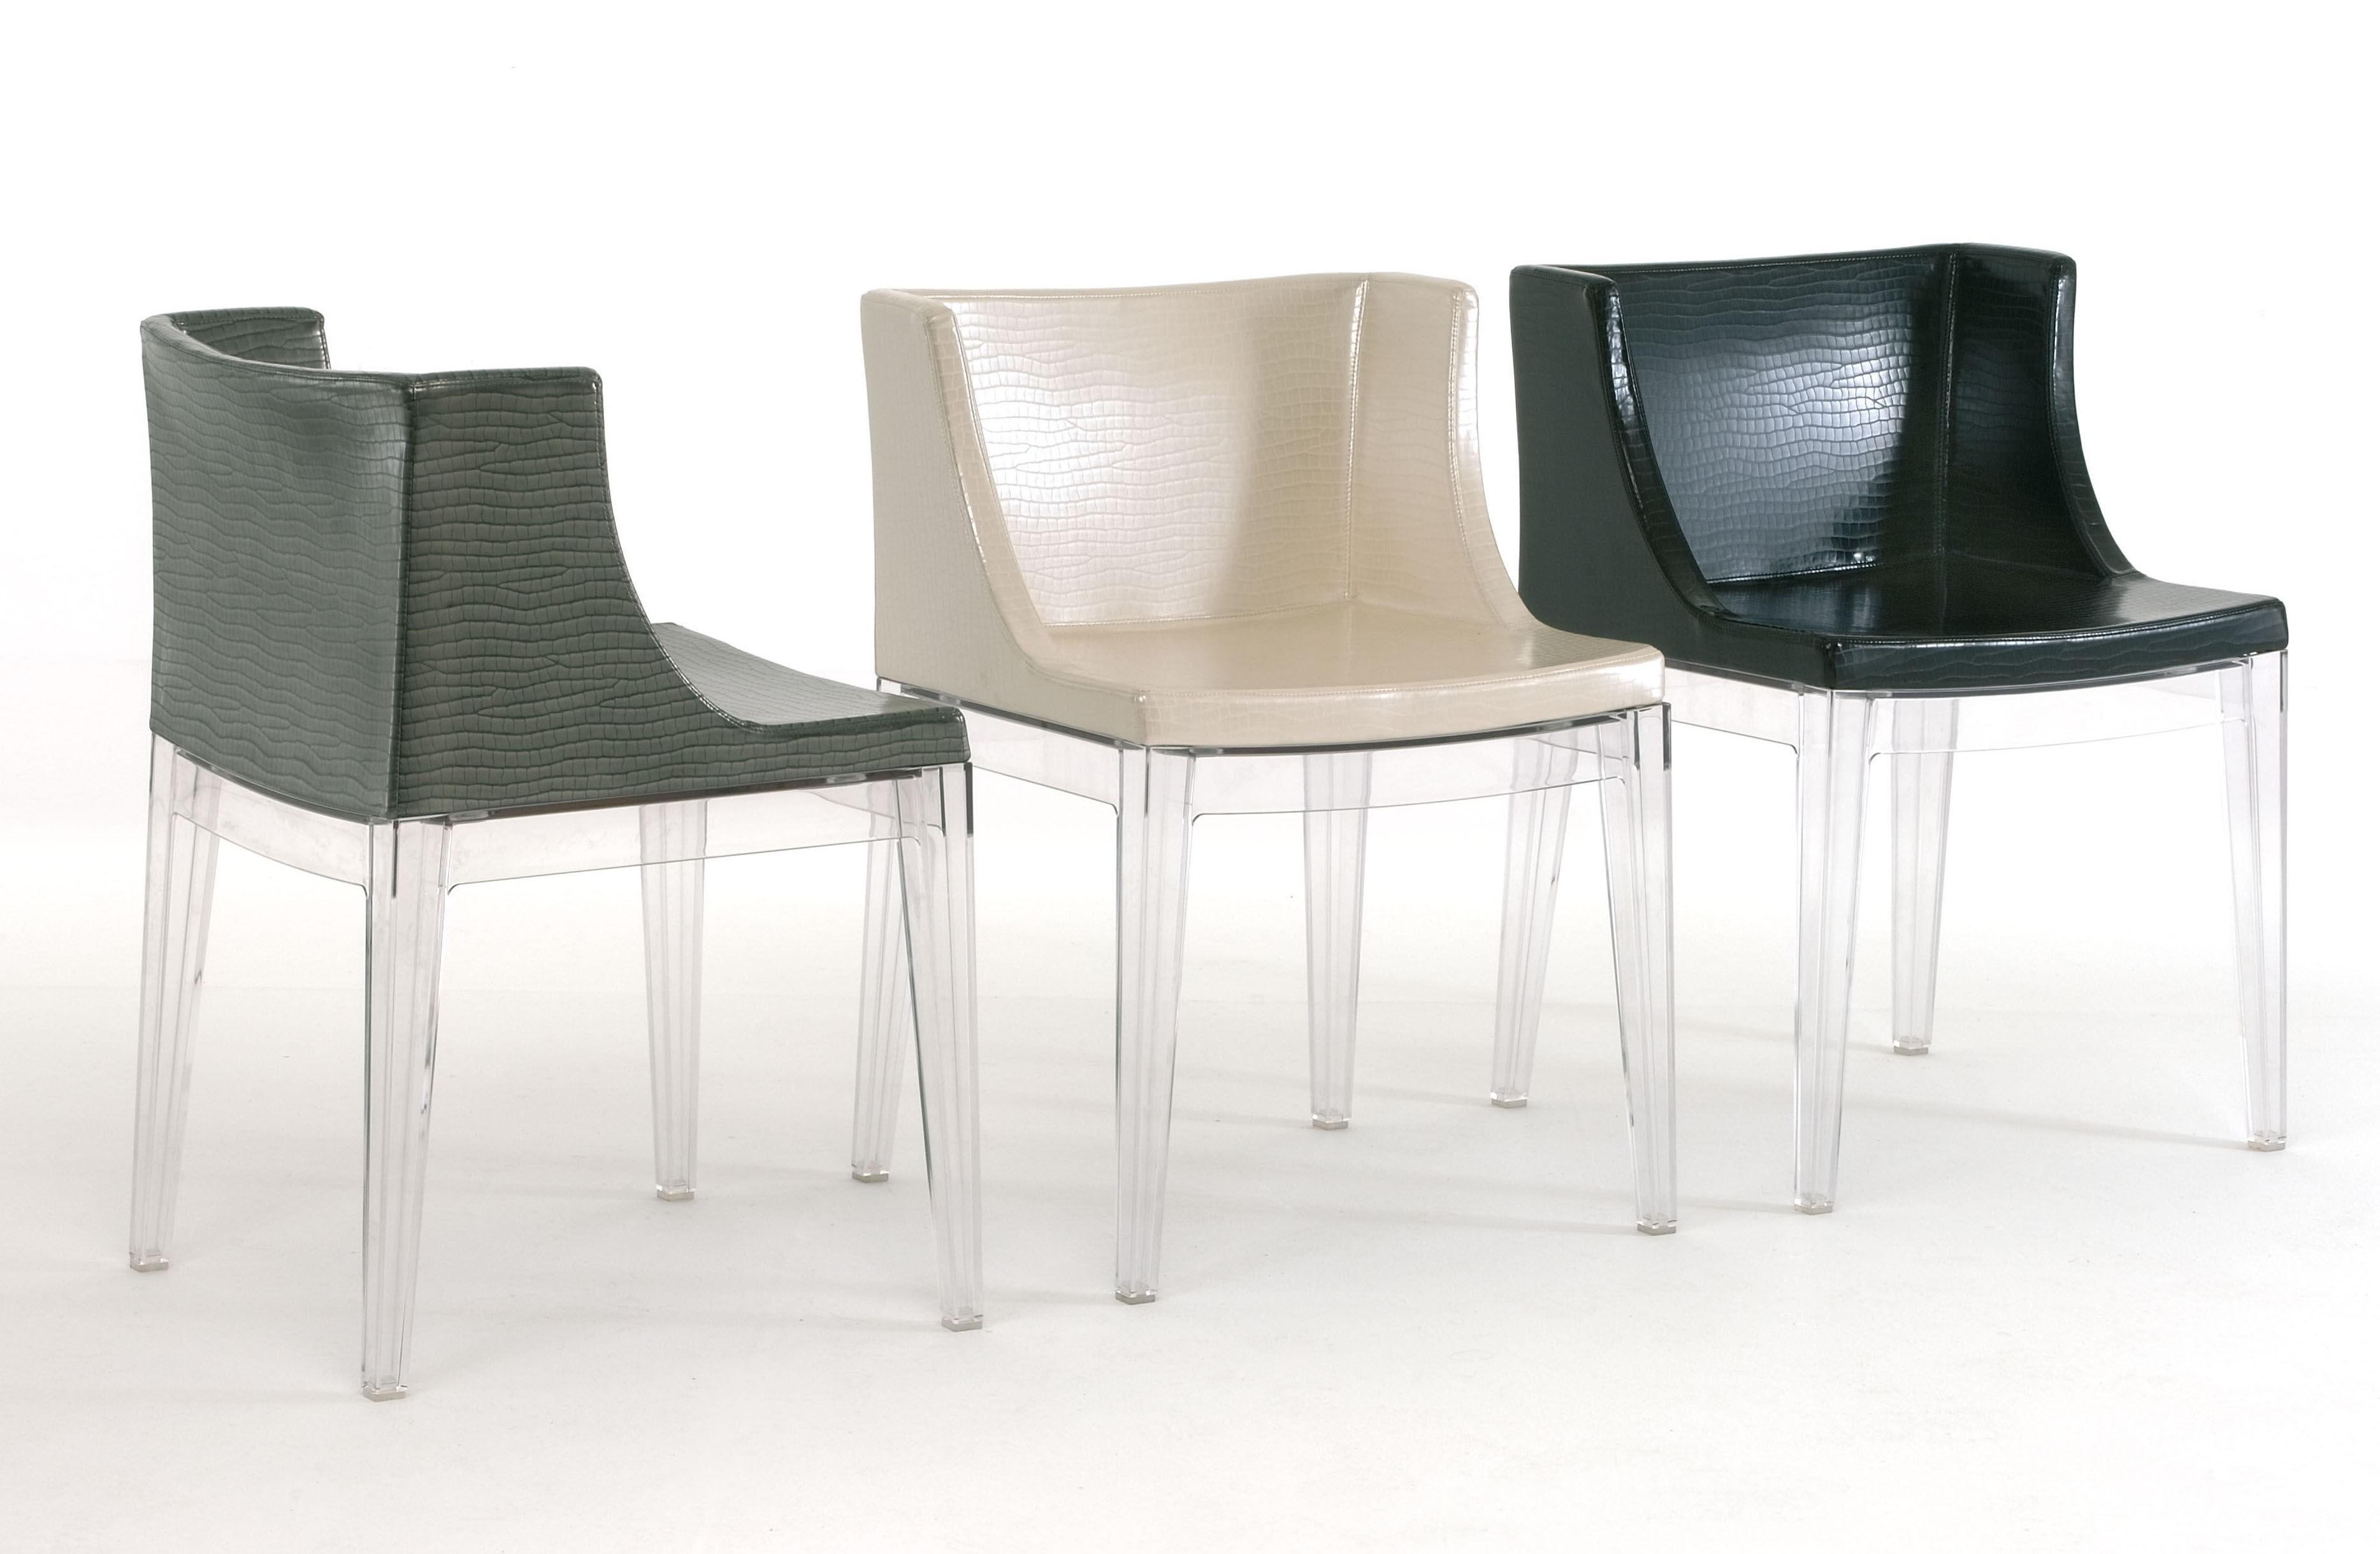 sillas officio mondo. Black Bedroom Furniture Sets. Home Design Ideas